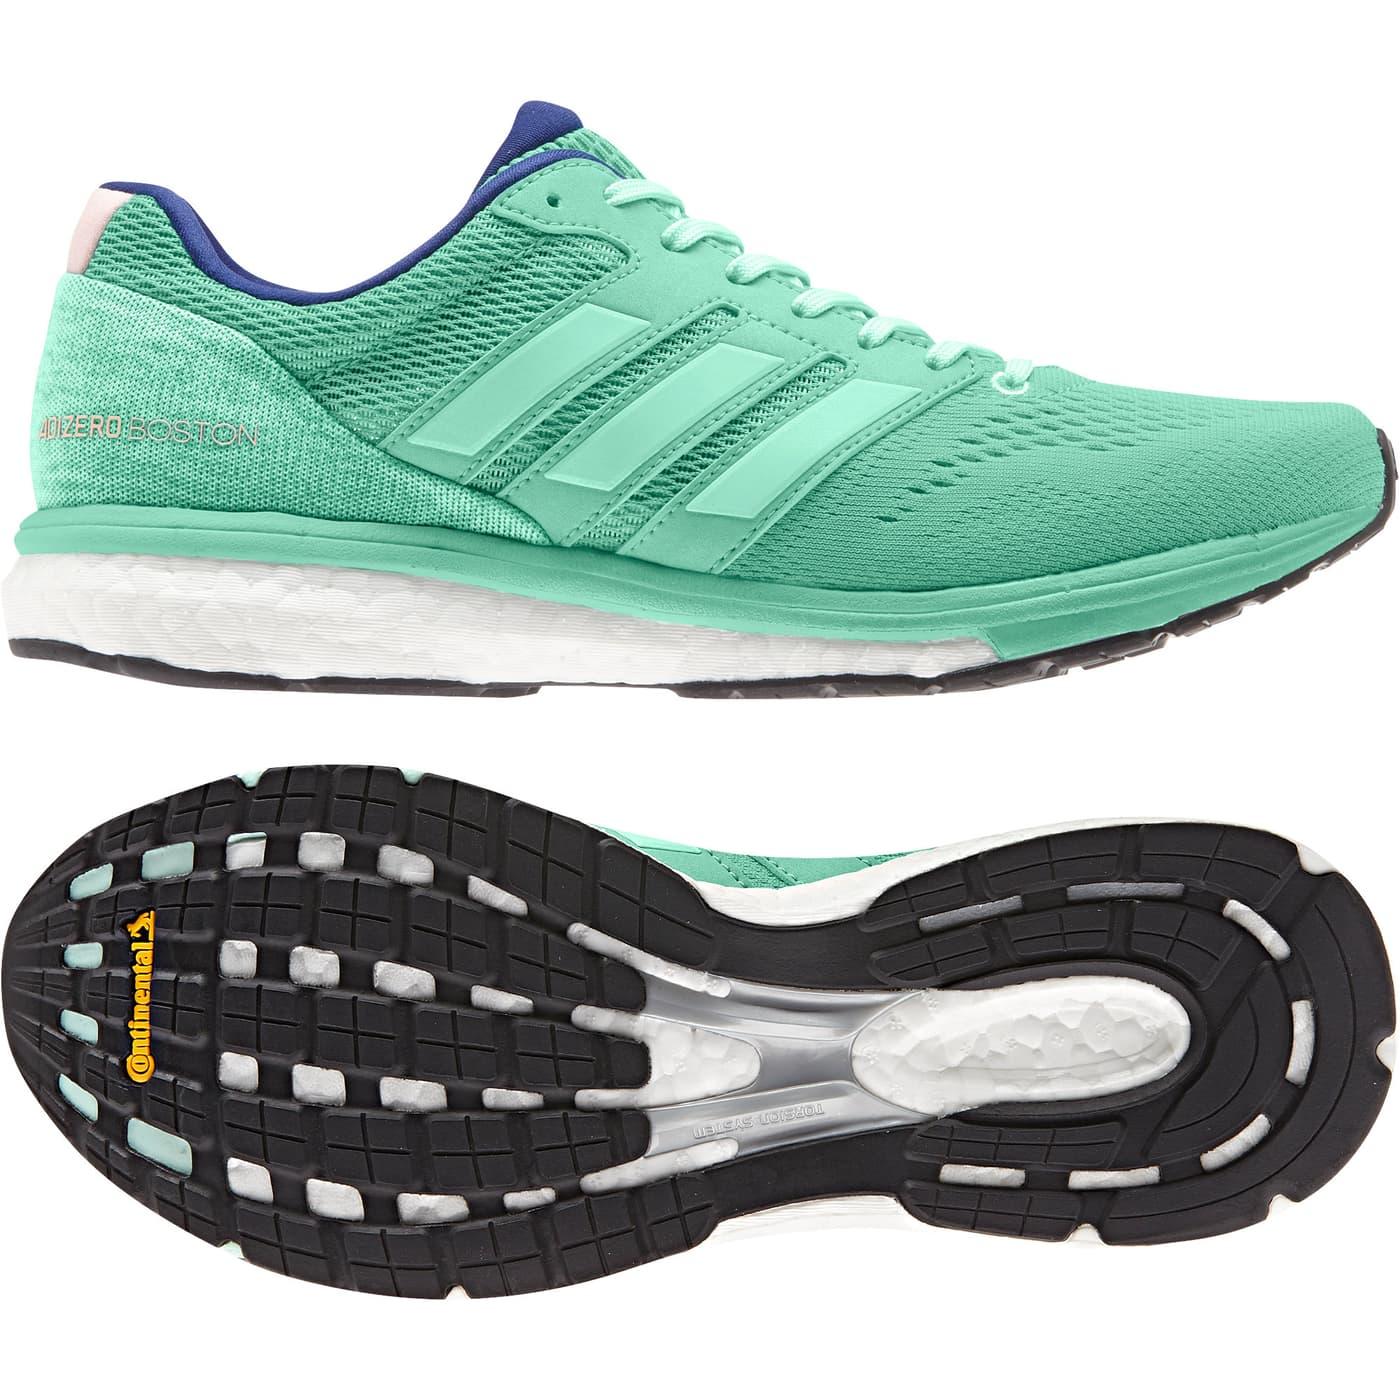 official photos 1fbe1 189aa ... Adidas Adizero Boston 7 Chaussures de course pour femme ...